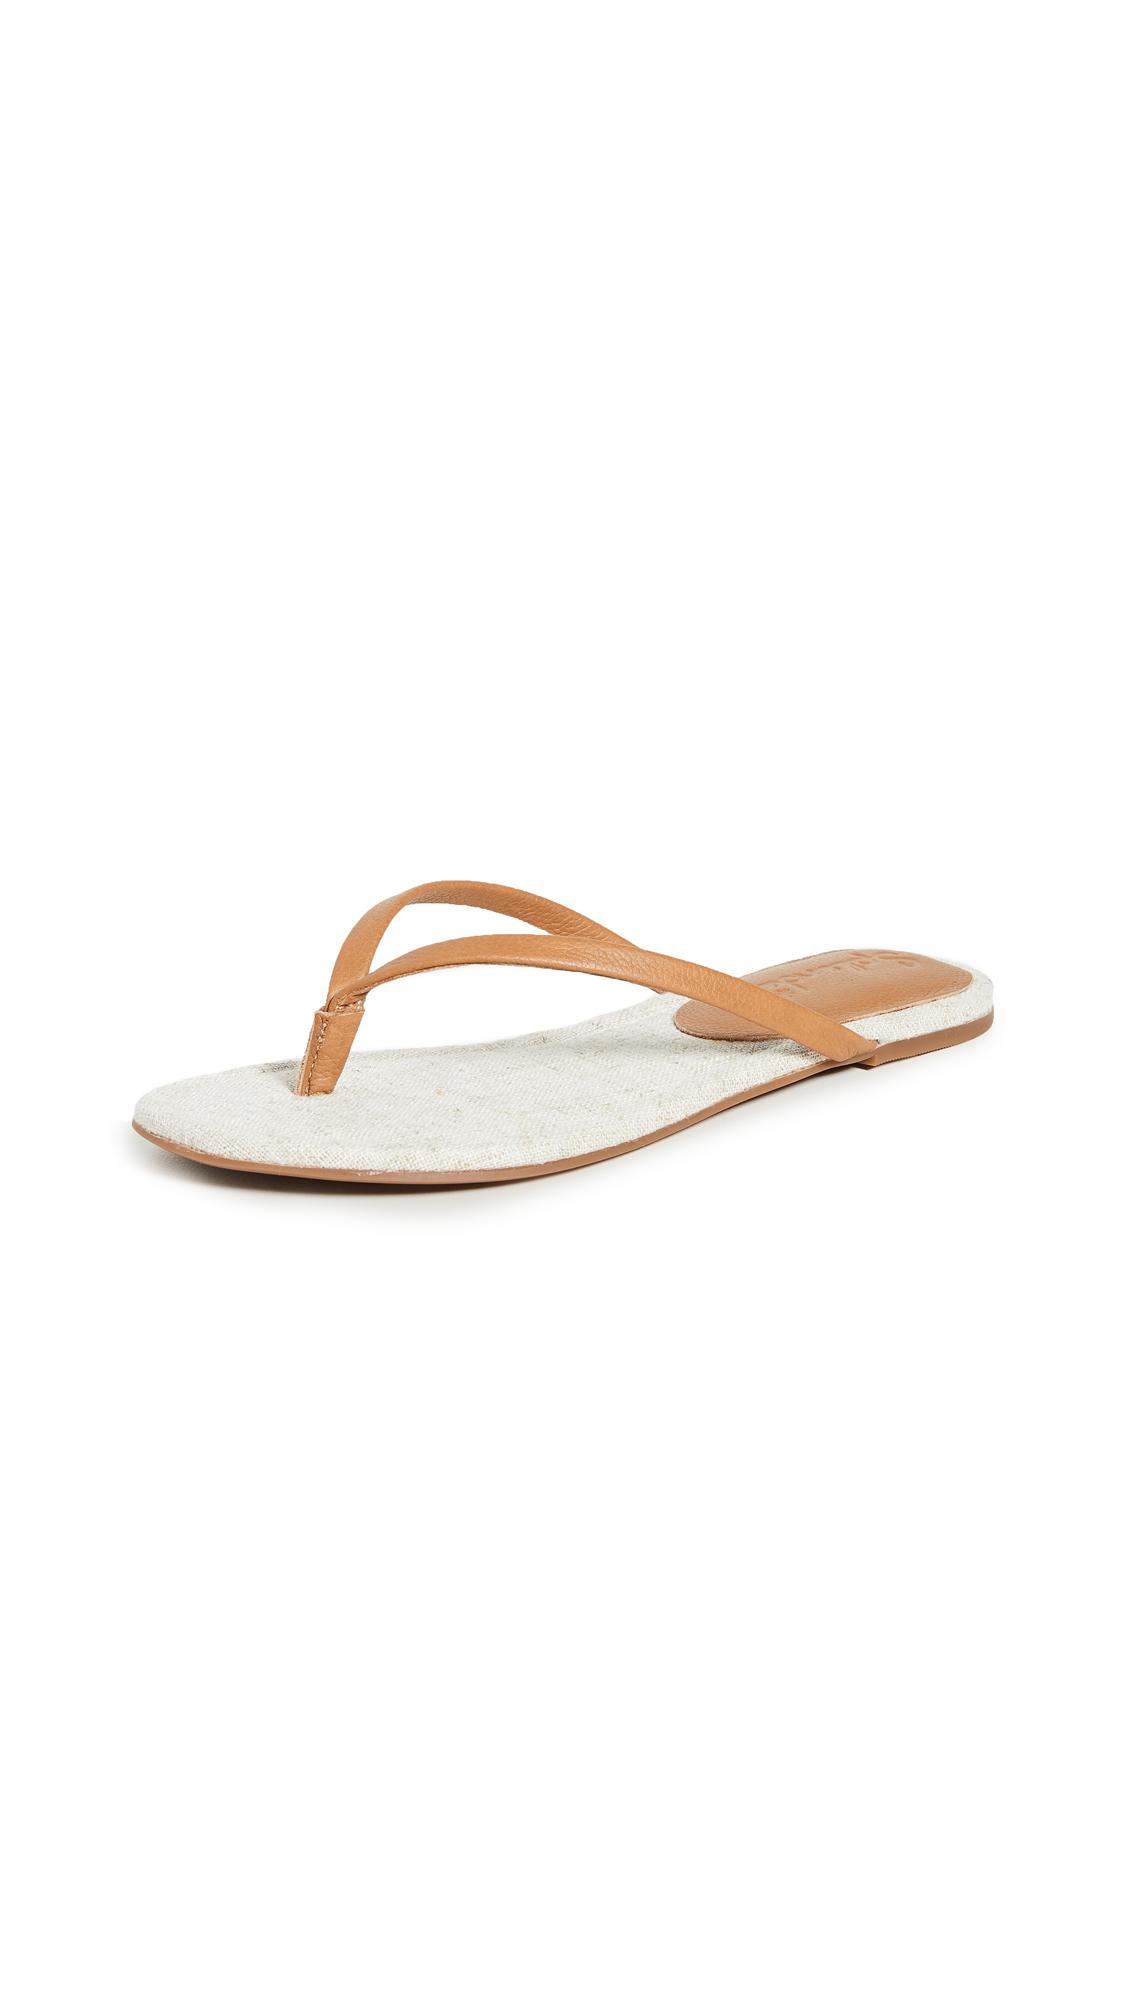 Splendid Ashlee Flip Flops – 50% Off Sale